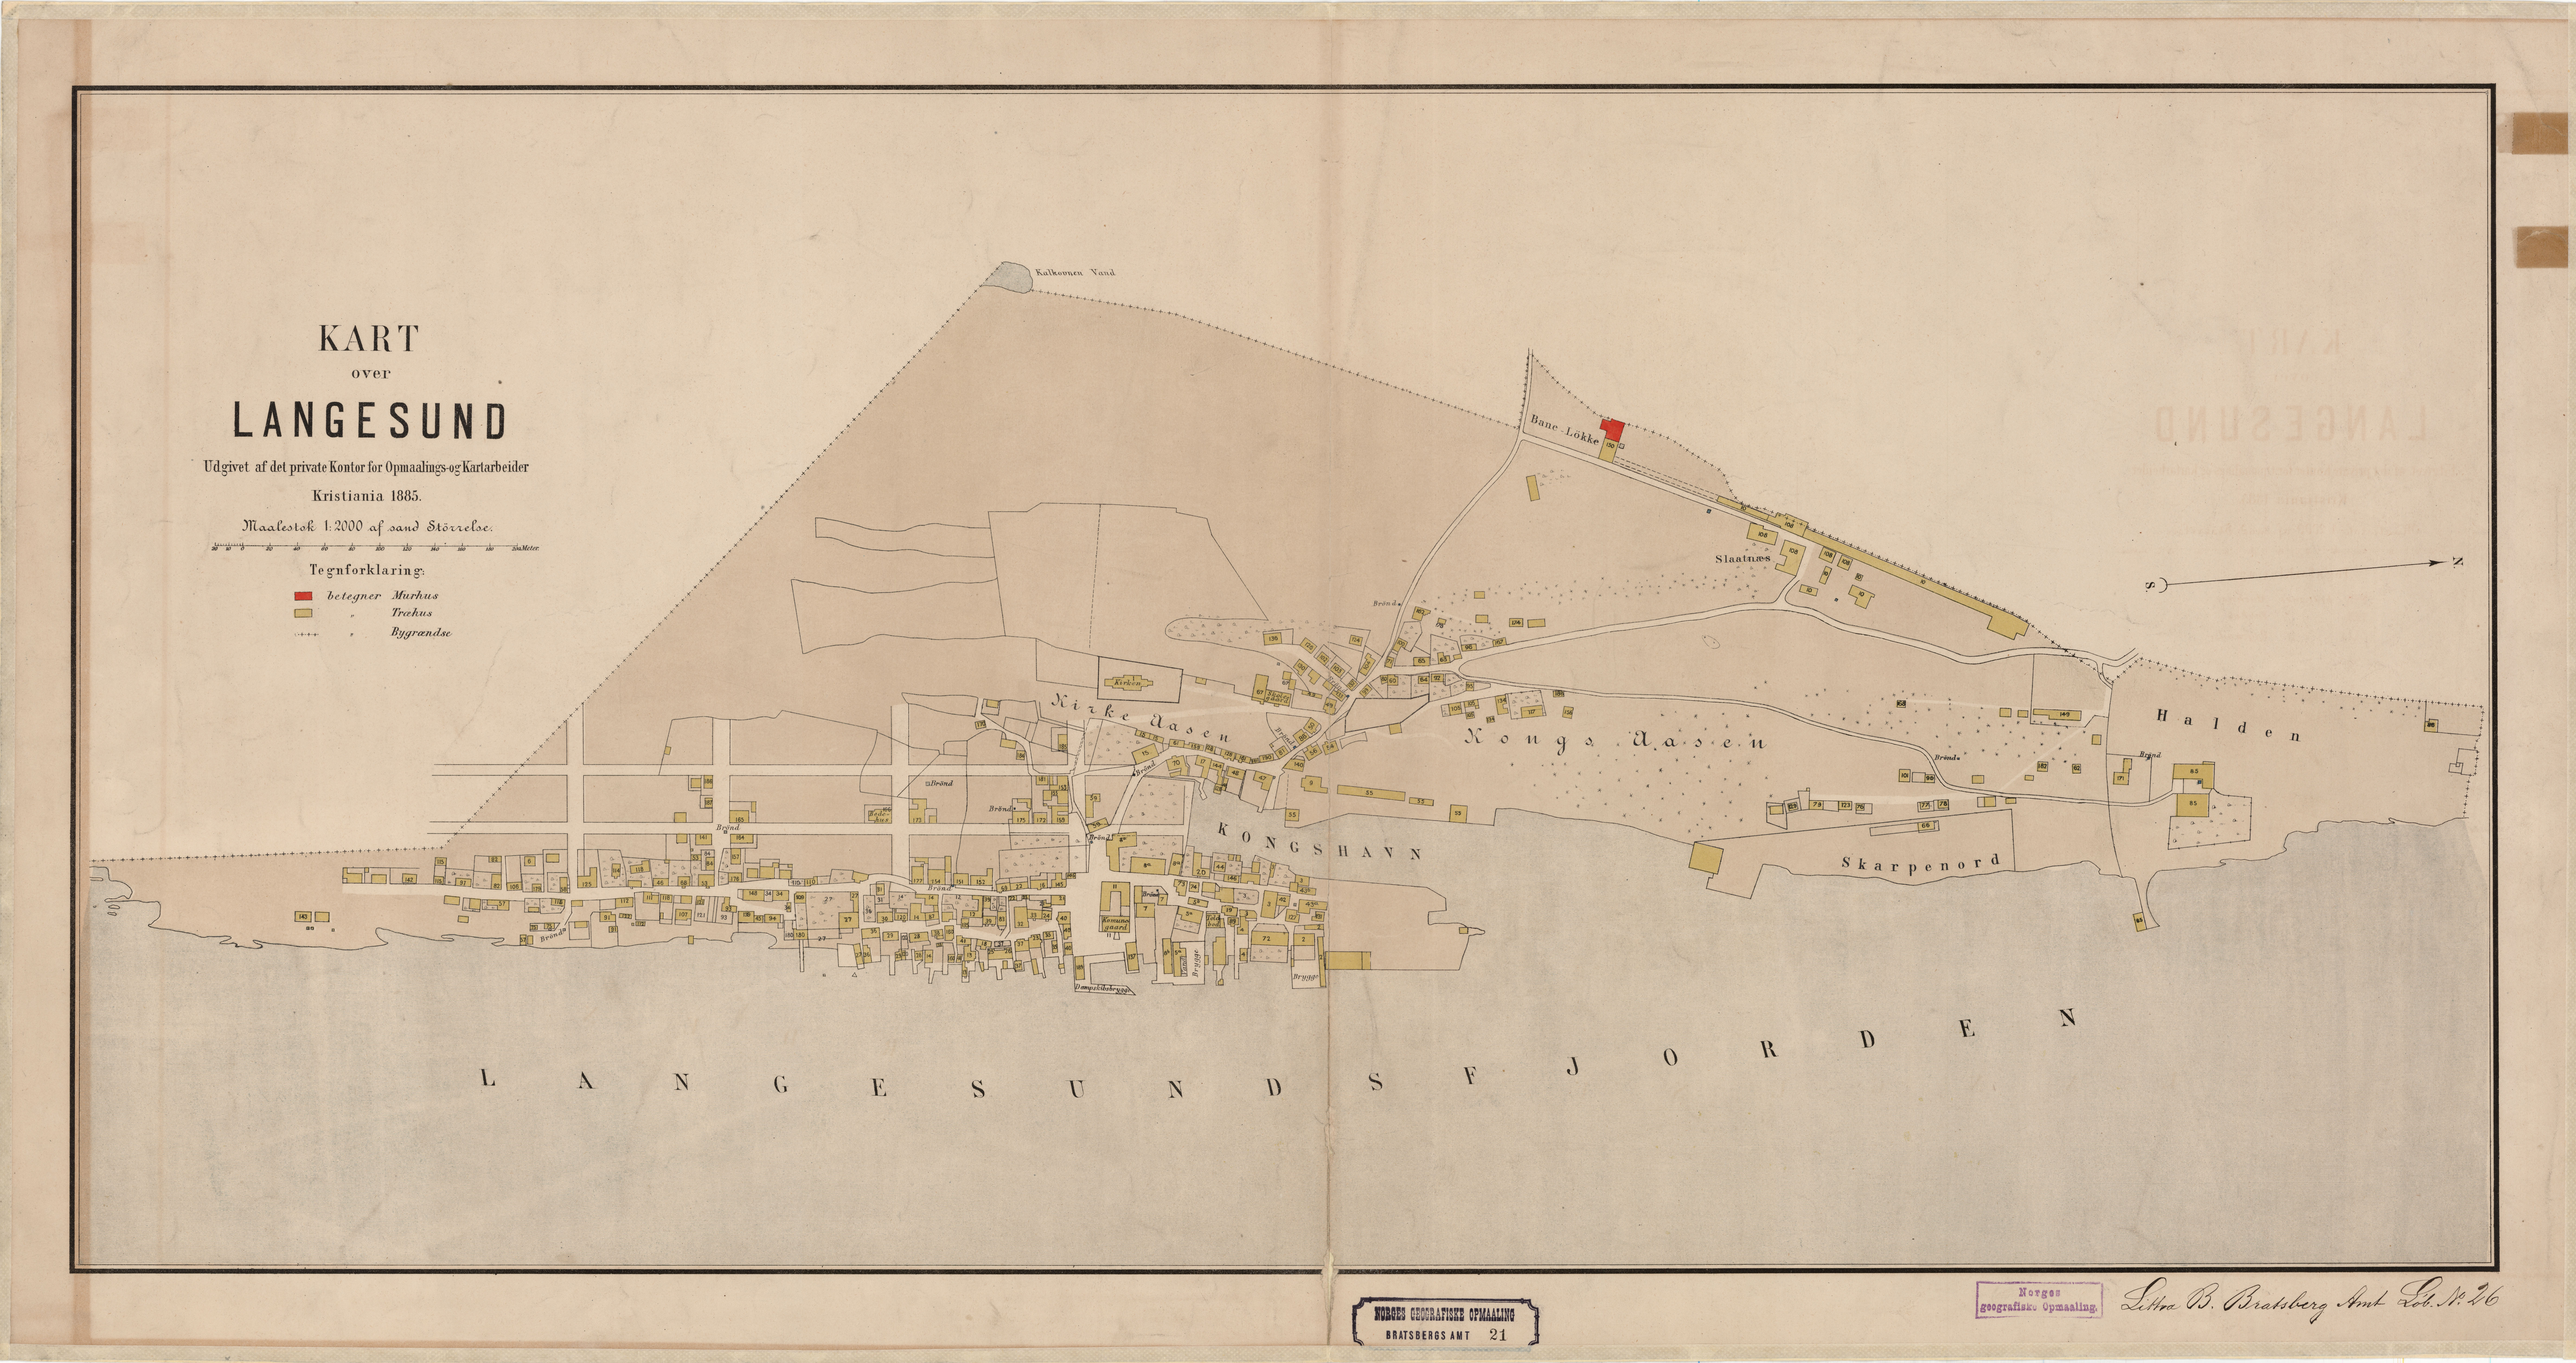 langesund kart File:Bratsberg amt nr 21  Kart over Langesund, 1885.  langesund kart